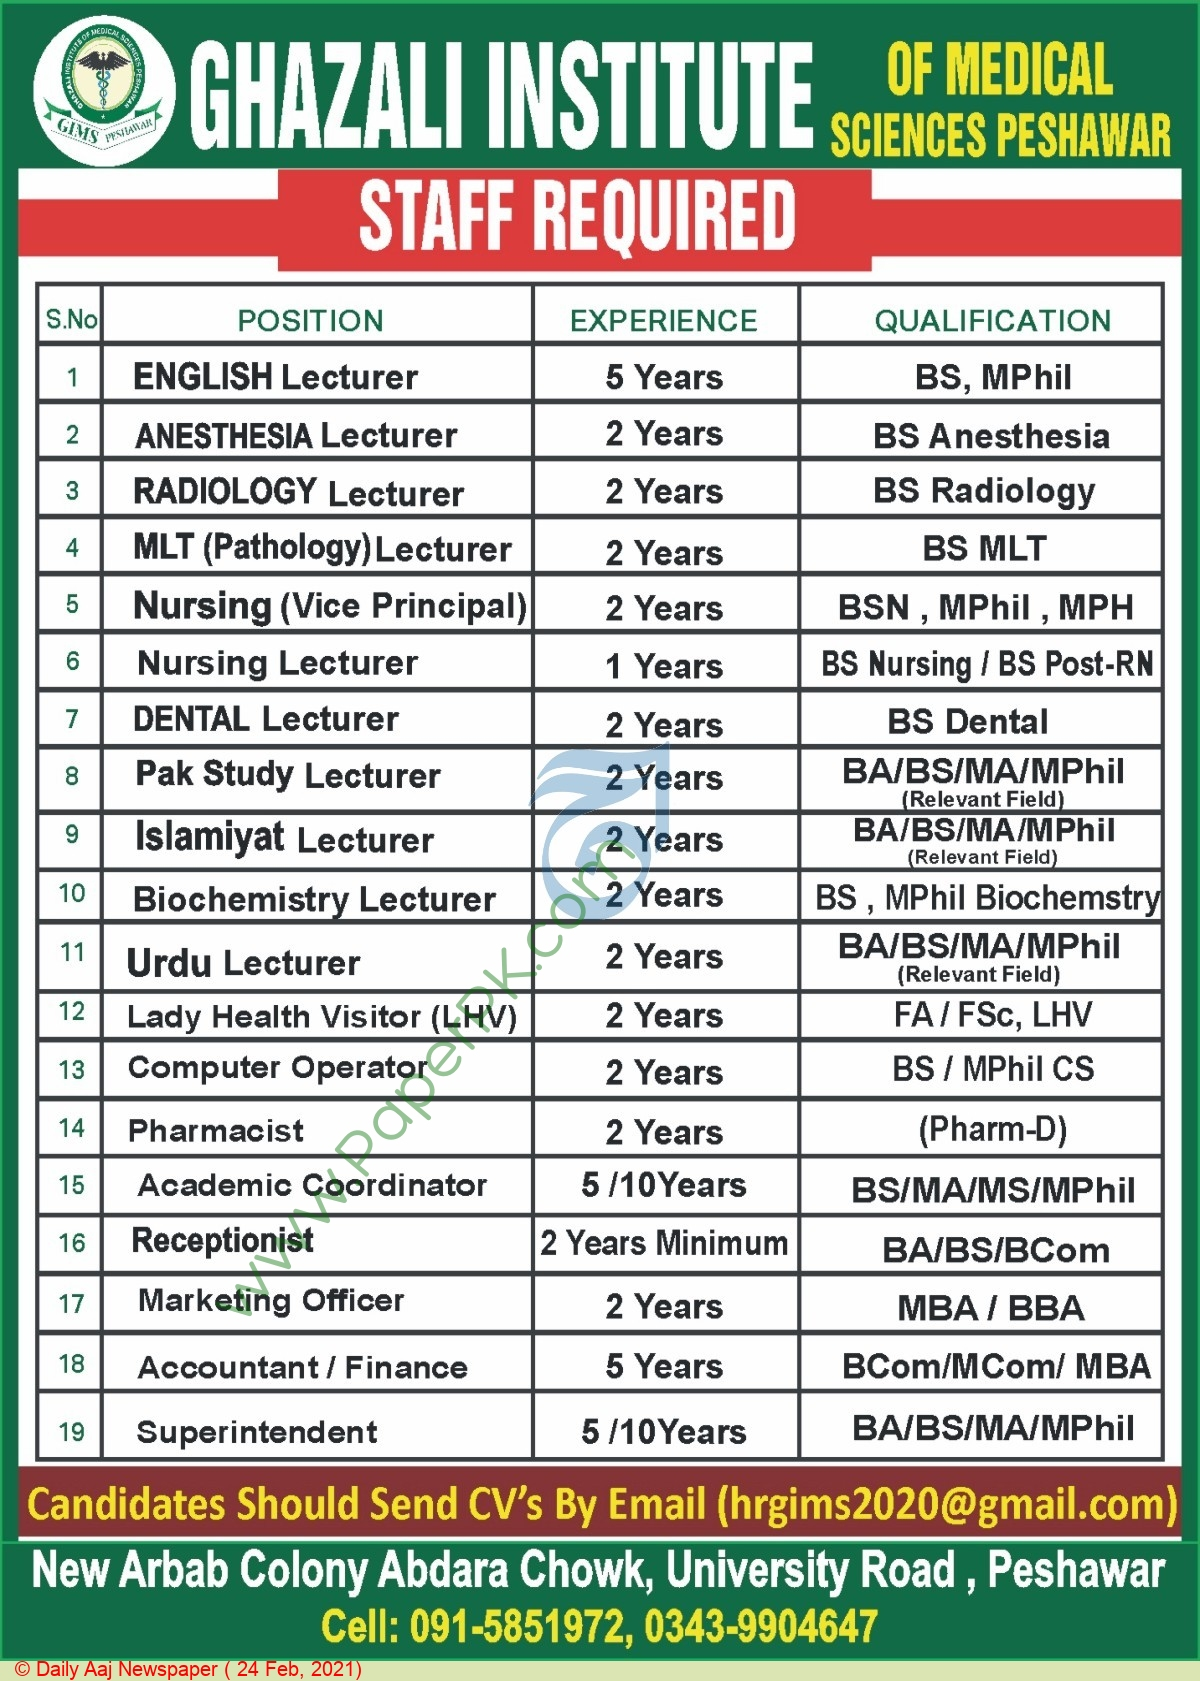 Ghazali Institute Of Medical Sciences jobs newspaper ad for Accountant in Peshawar on 2021-02-24